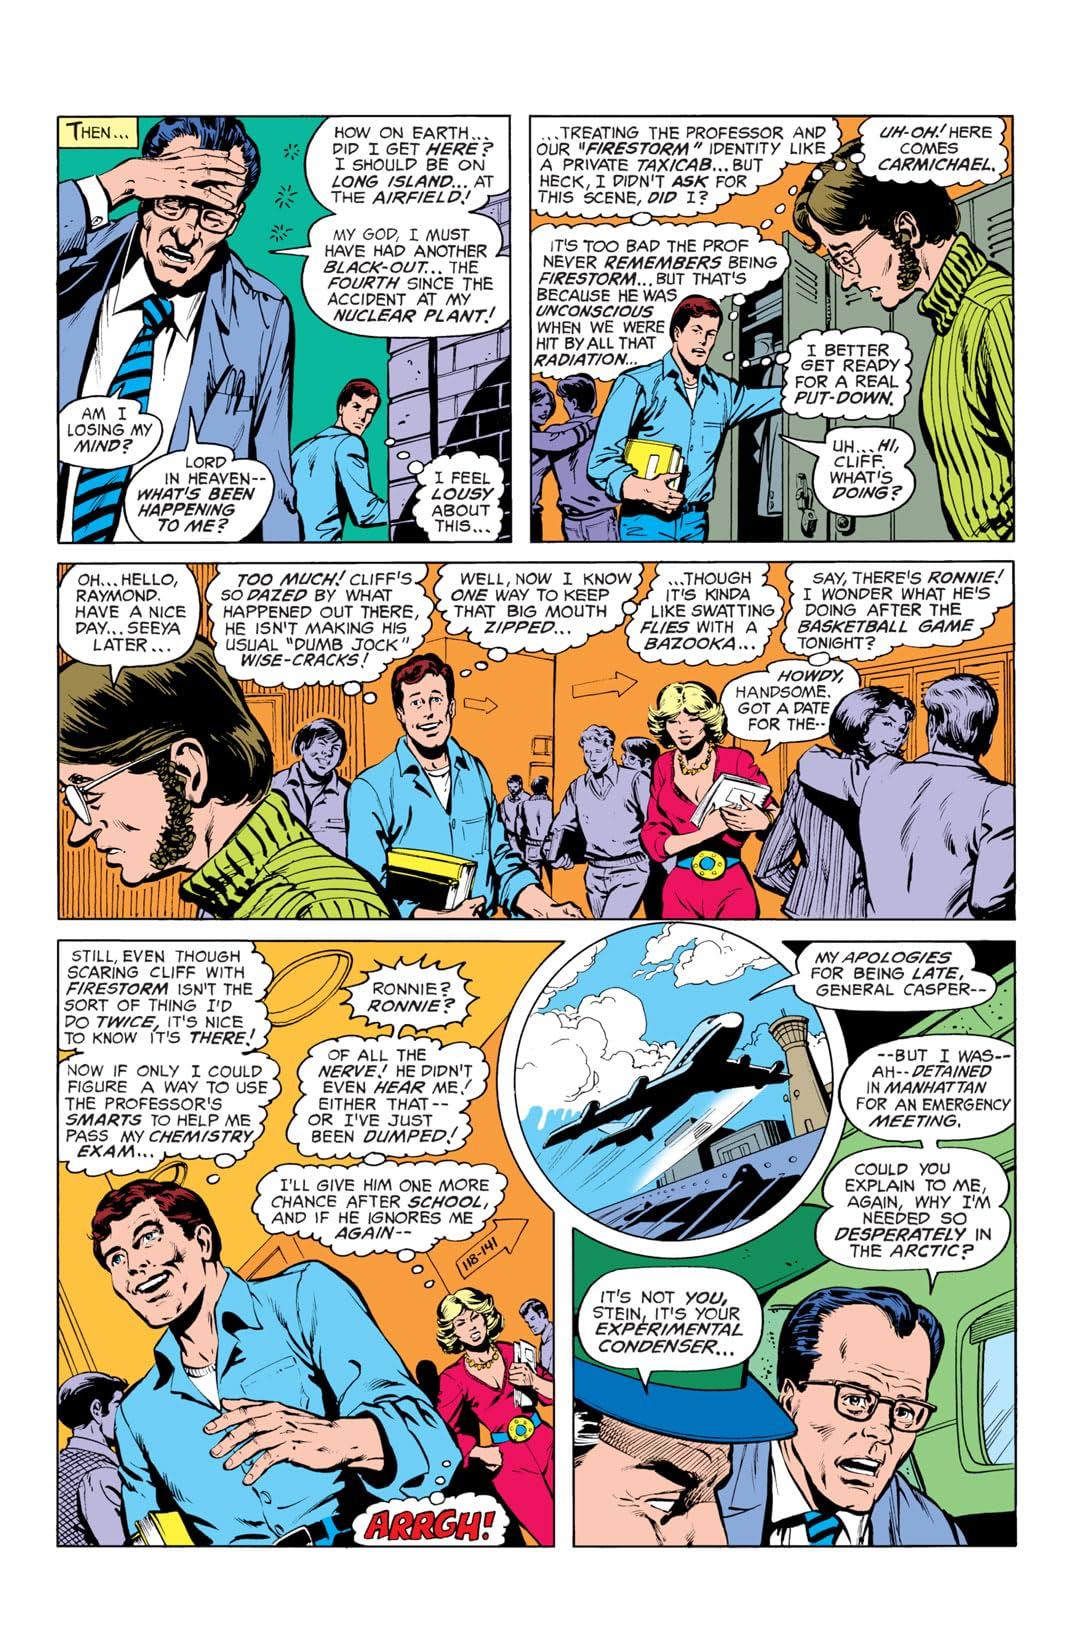 Firestorm: The Nuclear Man (1978) #3